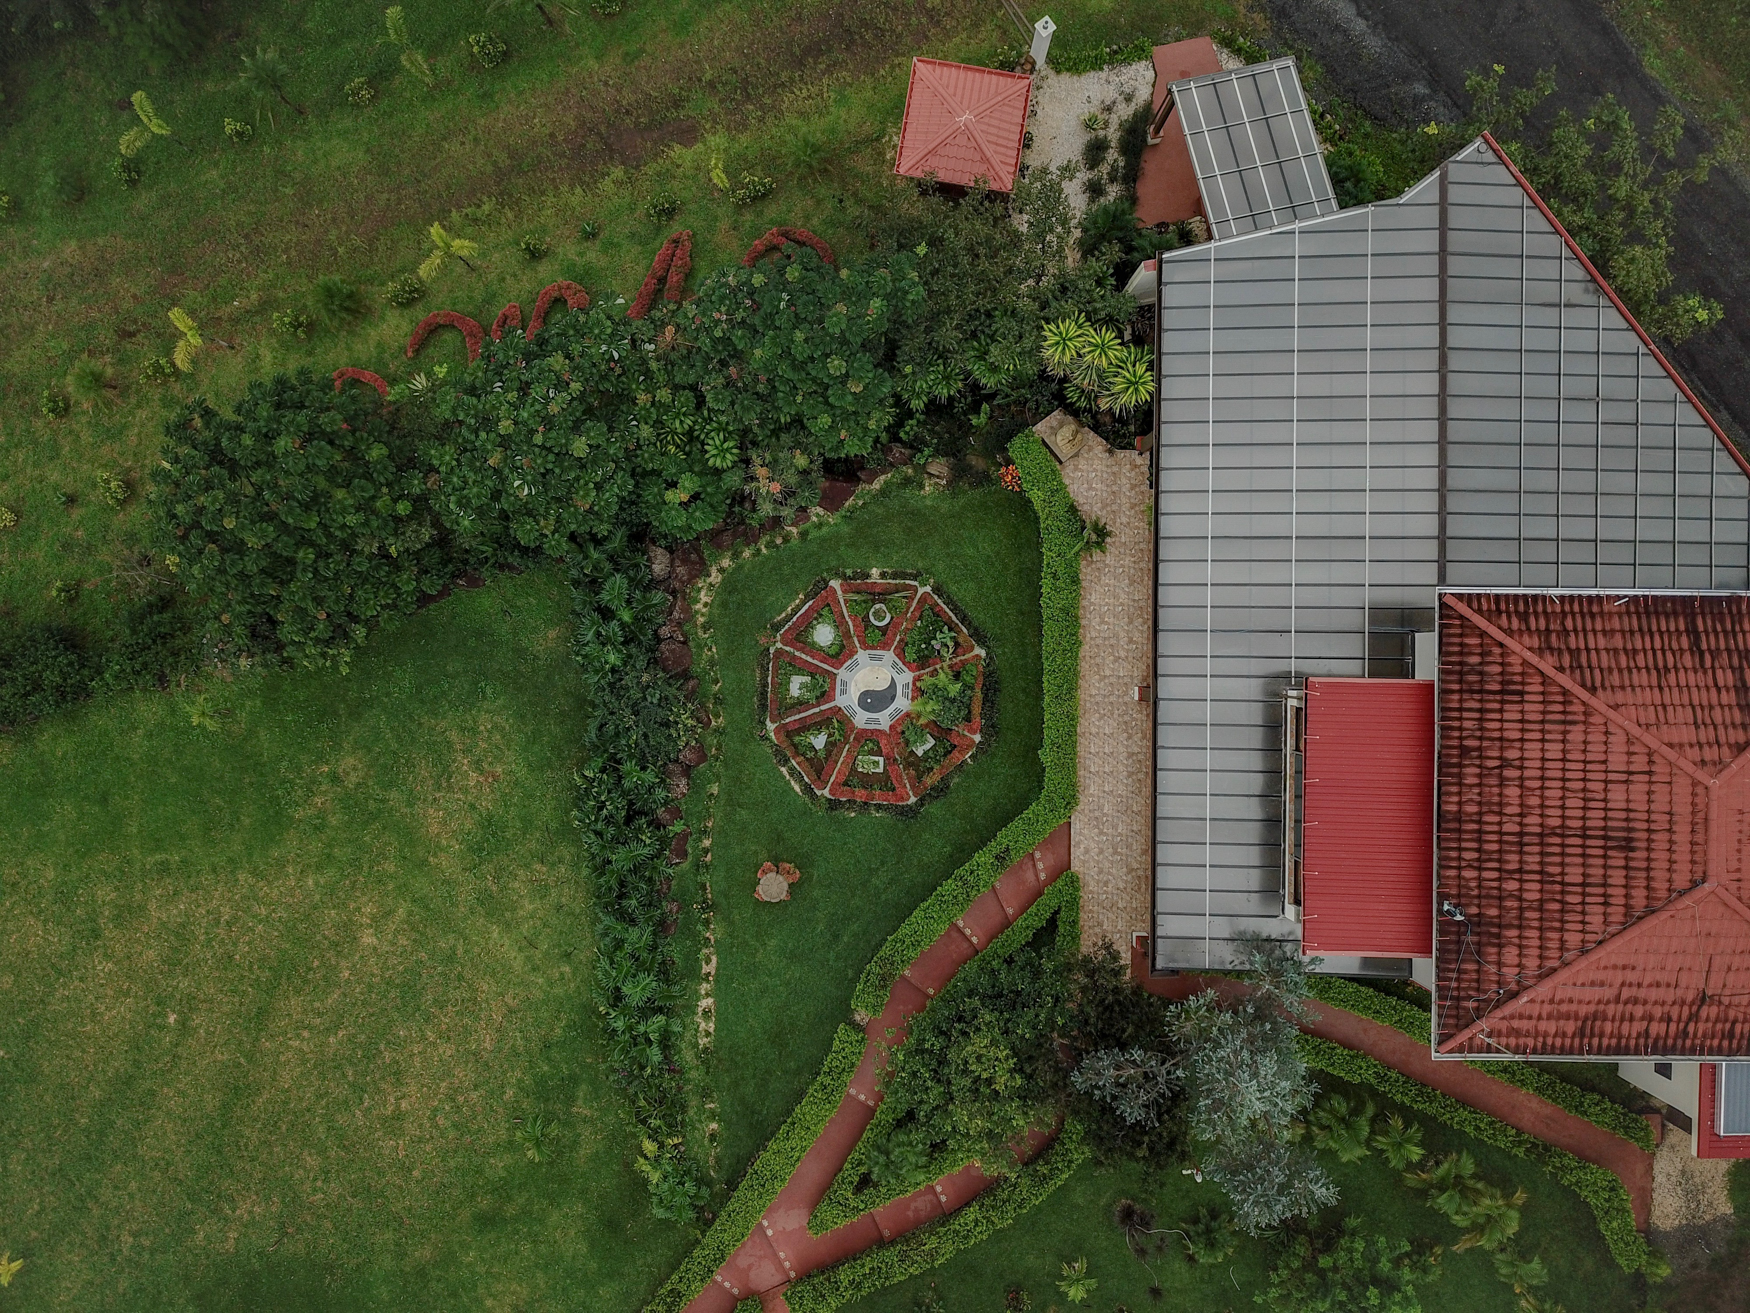 Yoga-Retreat-Drone-Photography-Costa-Rica-21.jpg